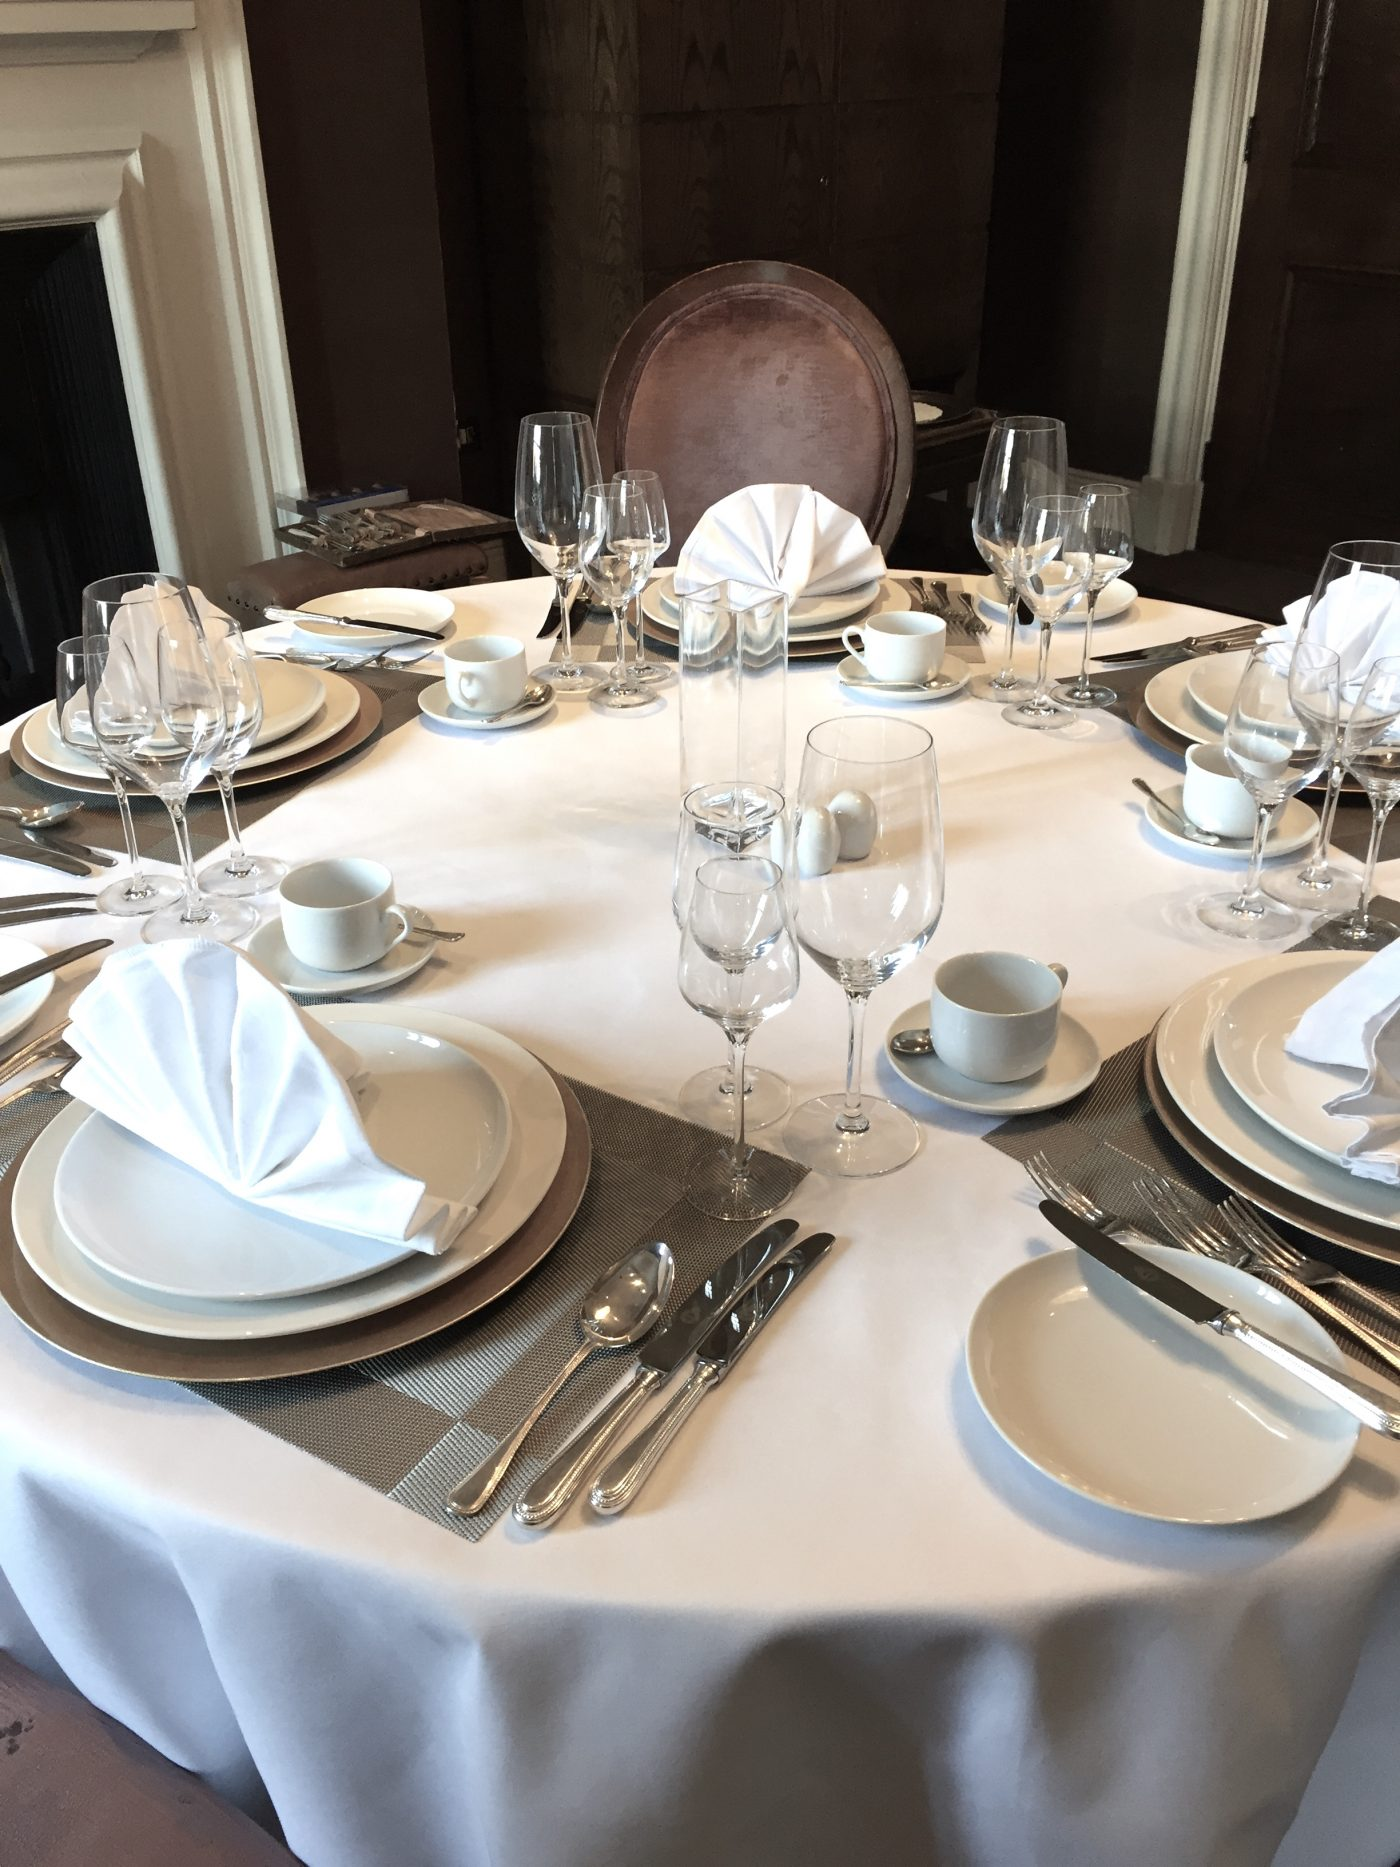 Silver Service Table